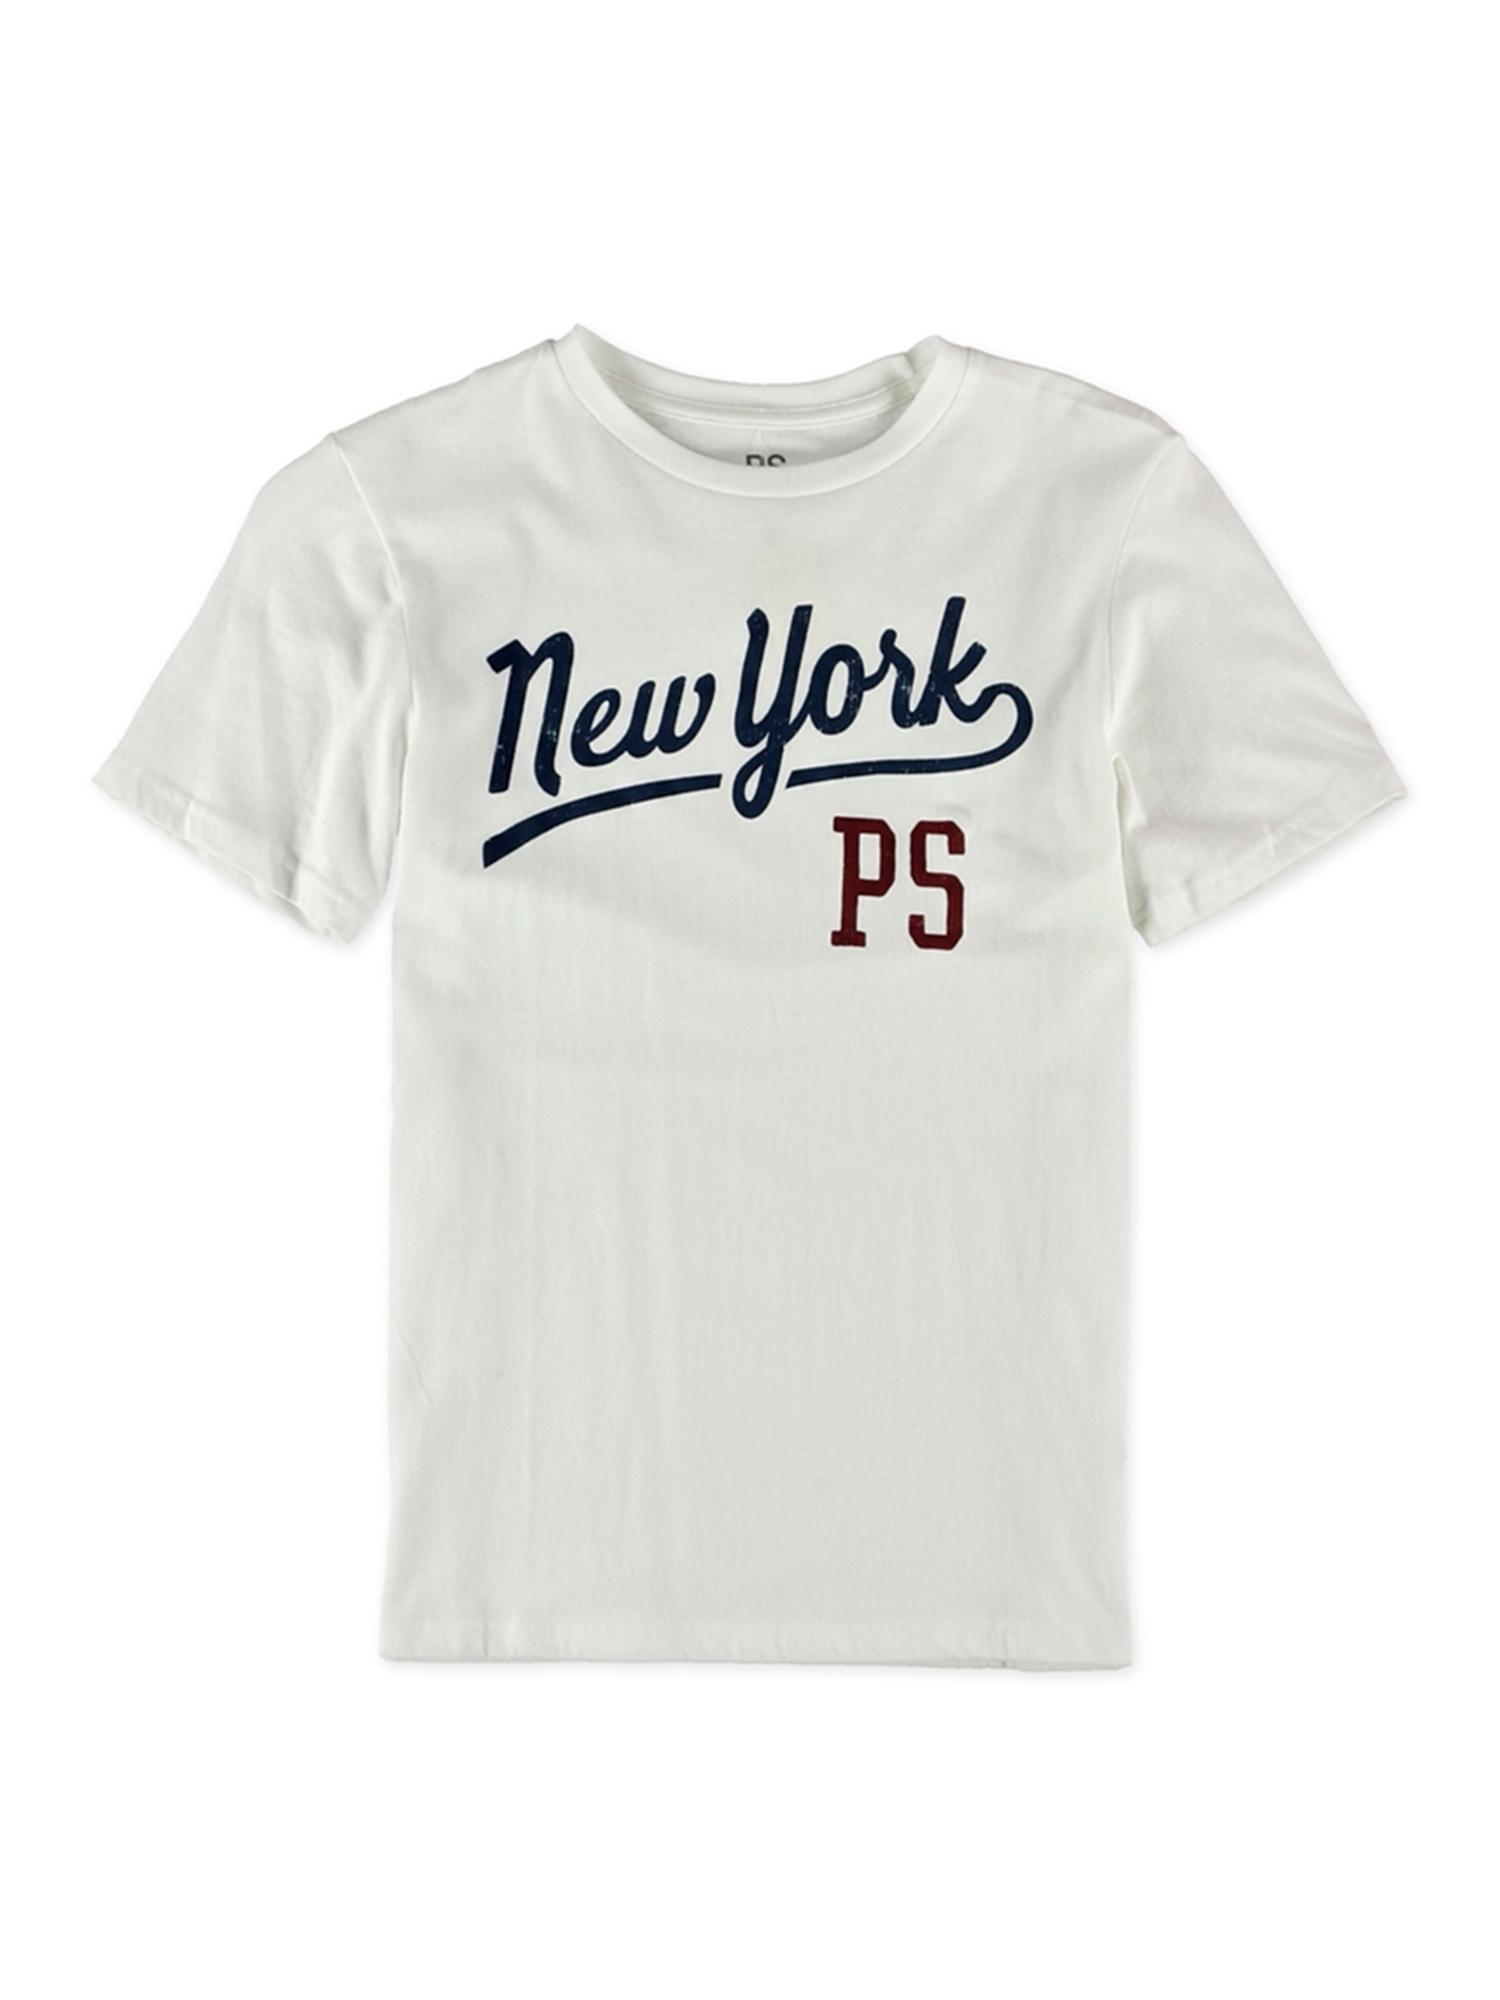 Aeropostale Boys New York Script Graphic T-Shirt